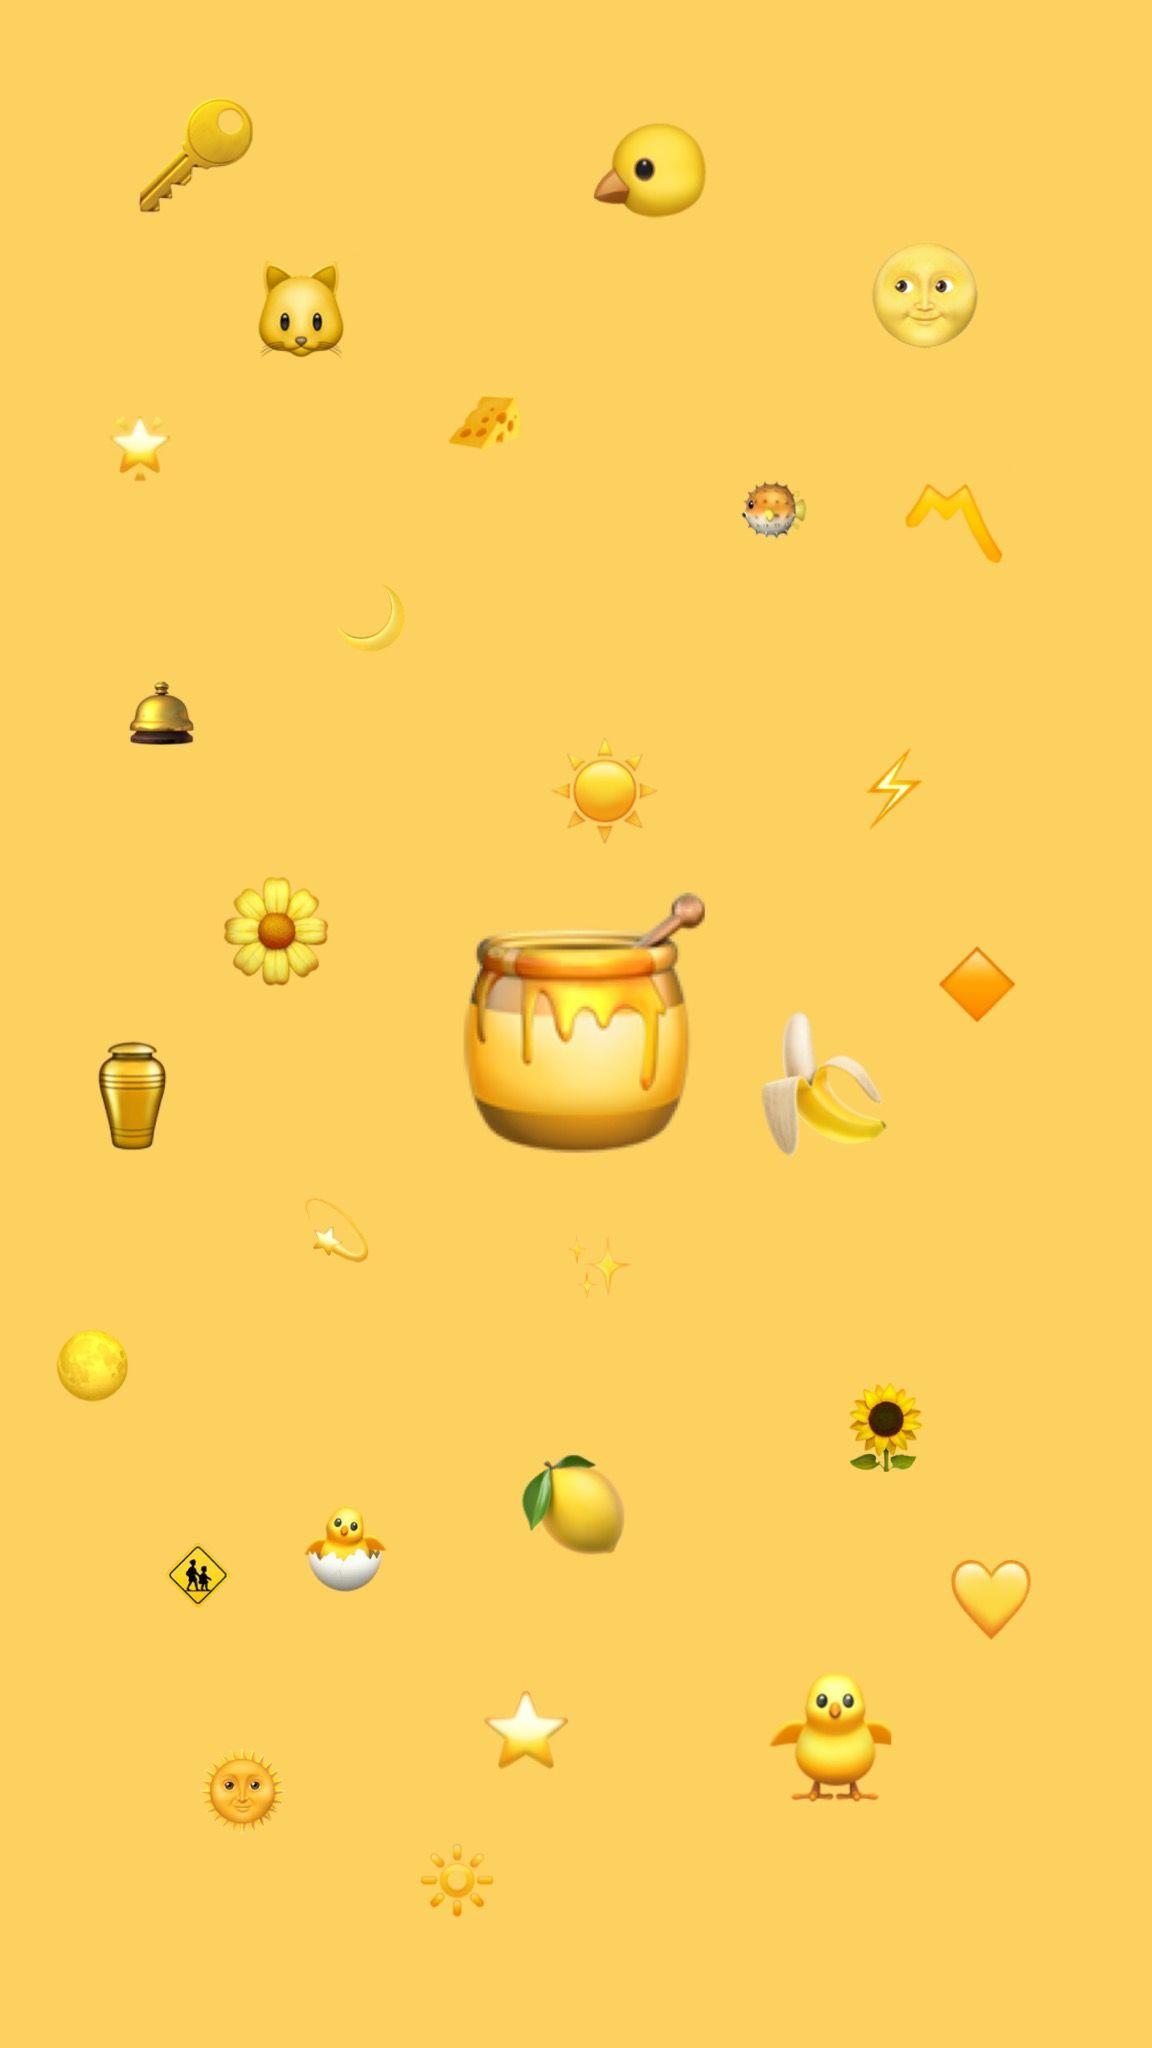 Yellow Girly Wallpaper : yellow, girly, wallpaper, Aesthetic, Yellow, Girly, Wallpapers, Wallpaper